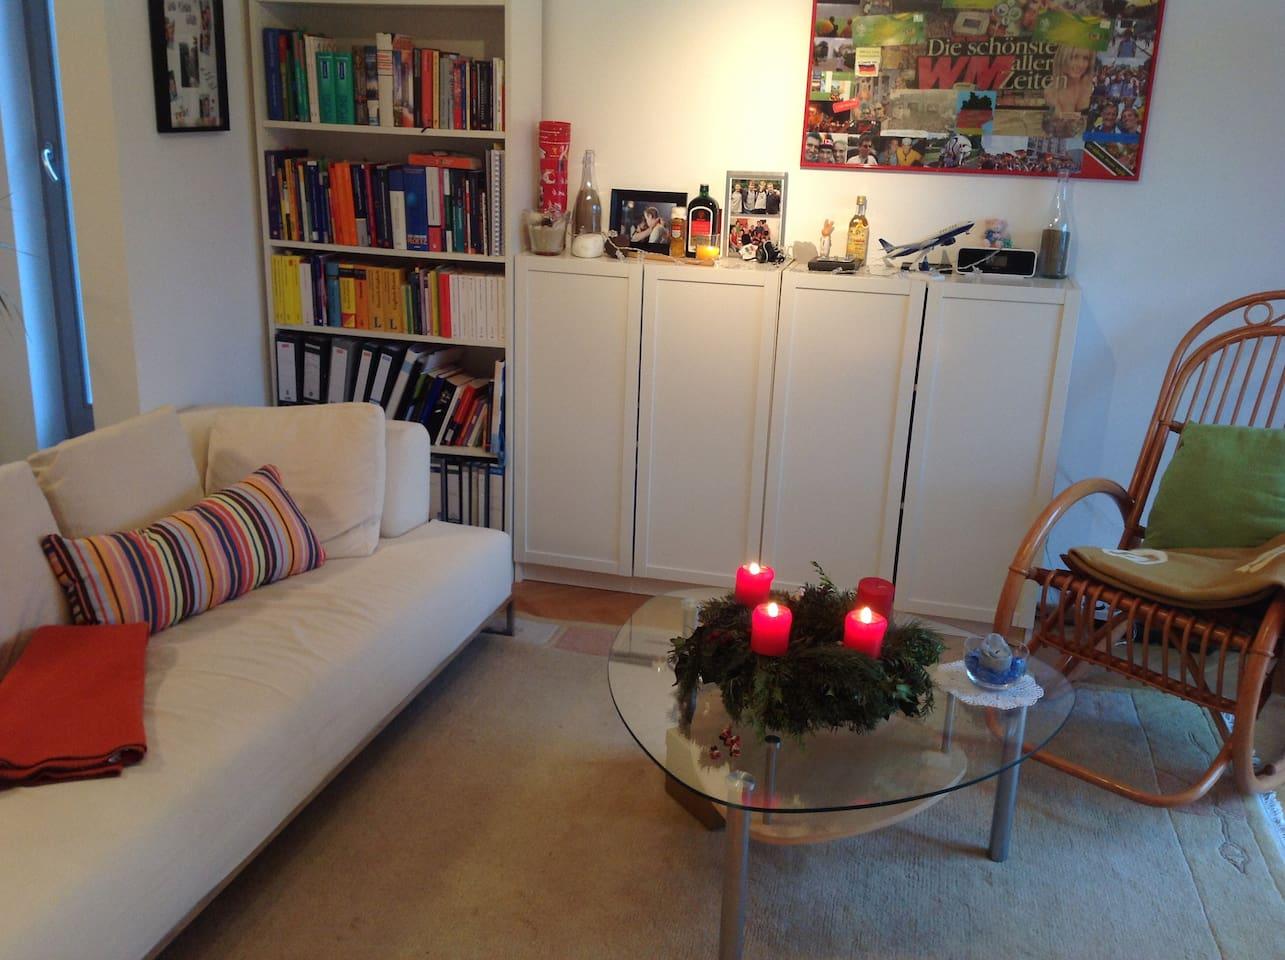 Quiet, cozy home with great lighting